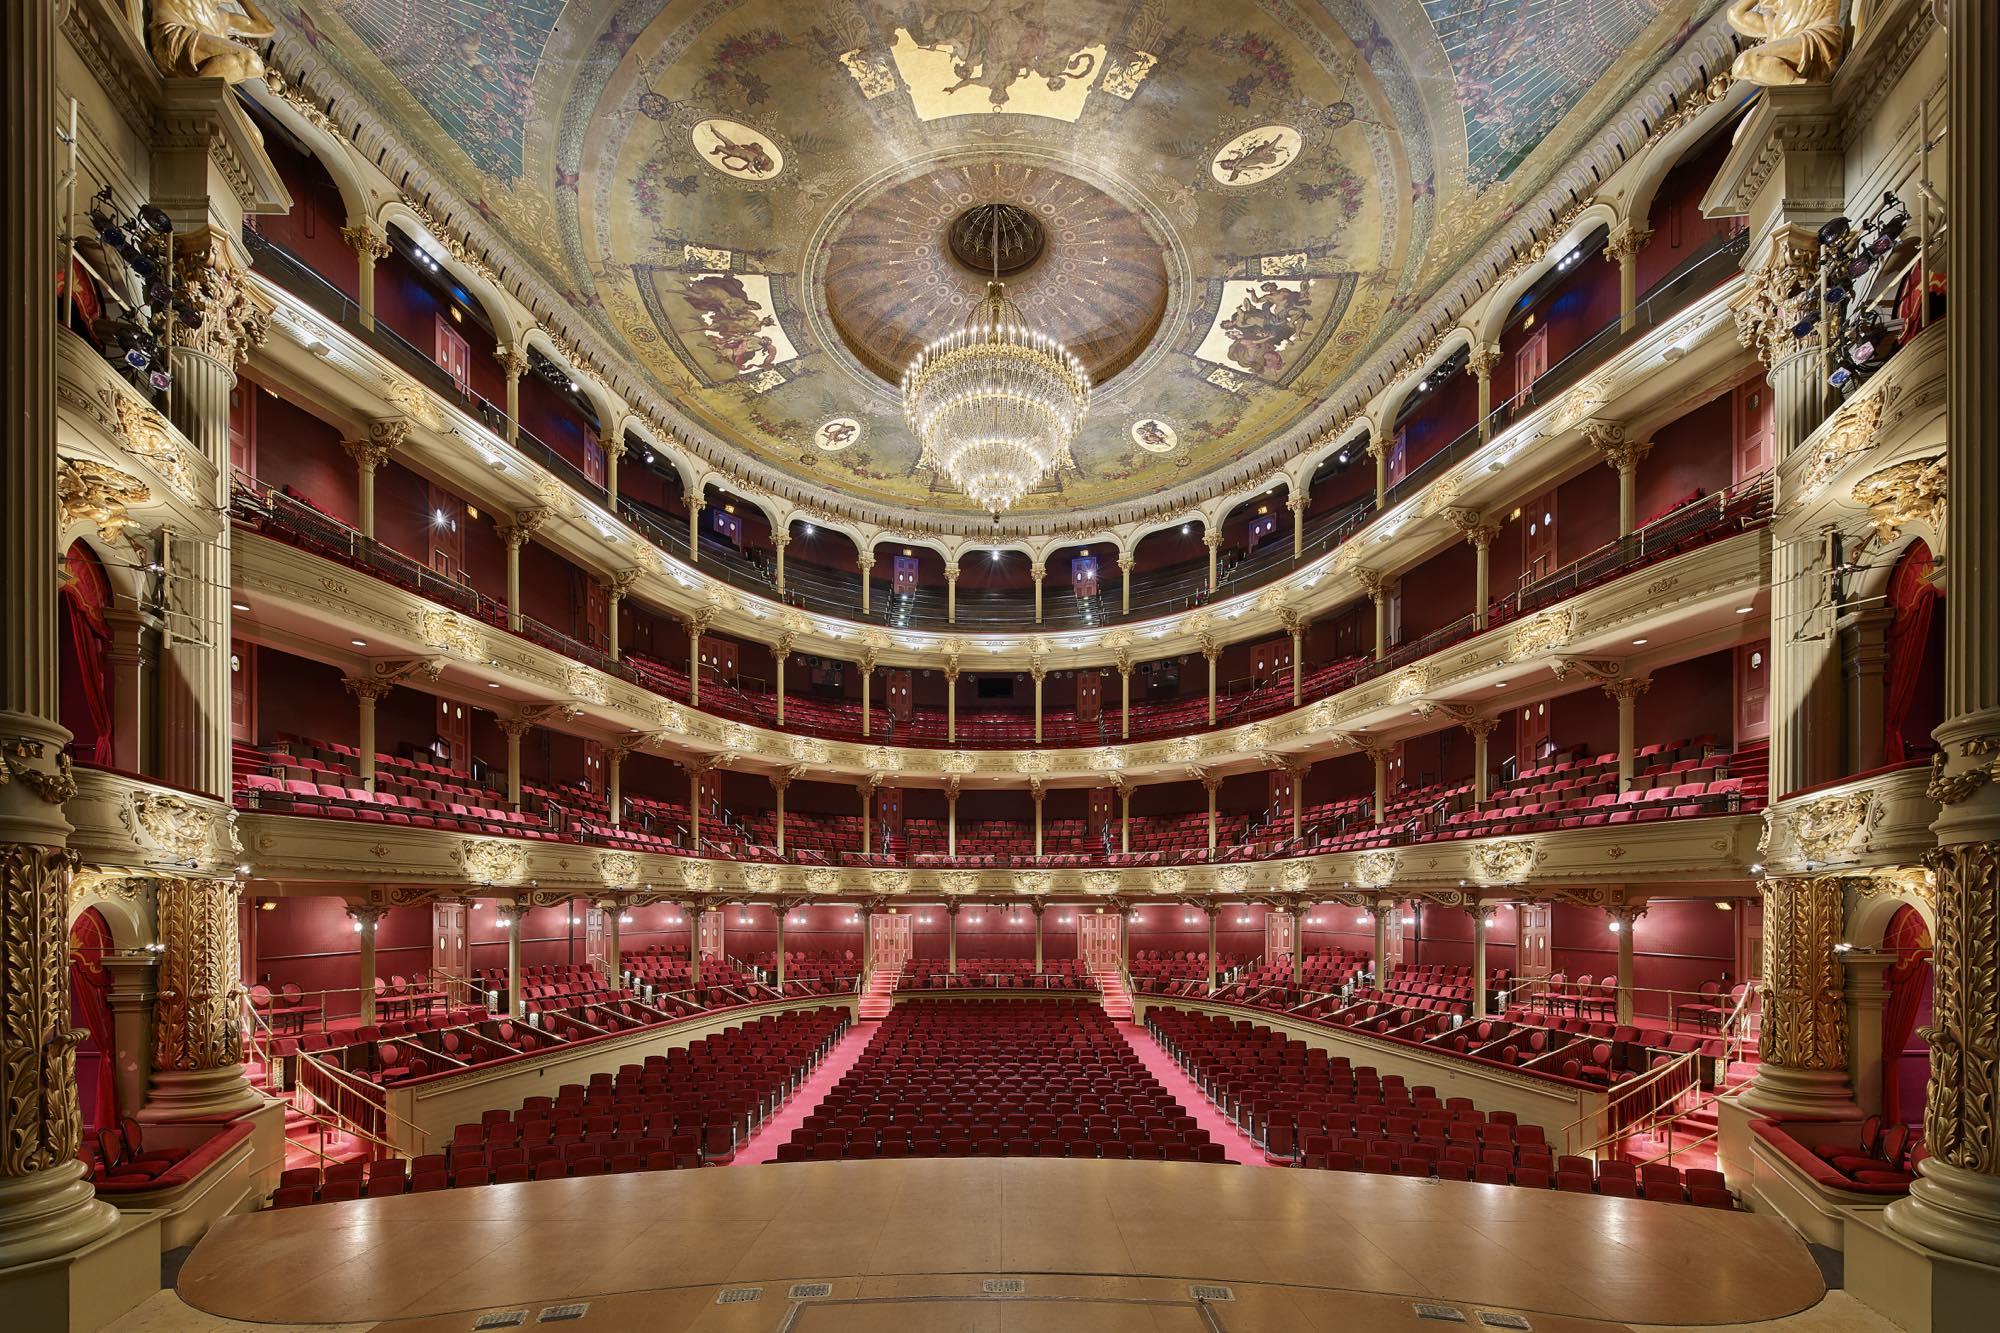 Academy Of Music Seating Improvements Voith And Mactavish